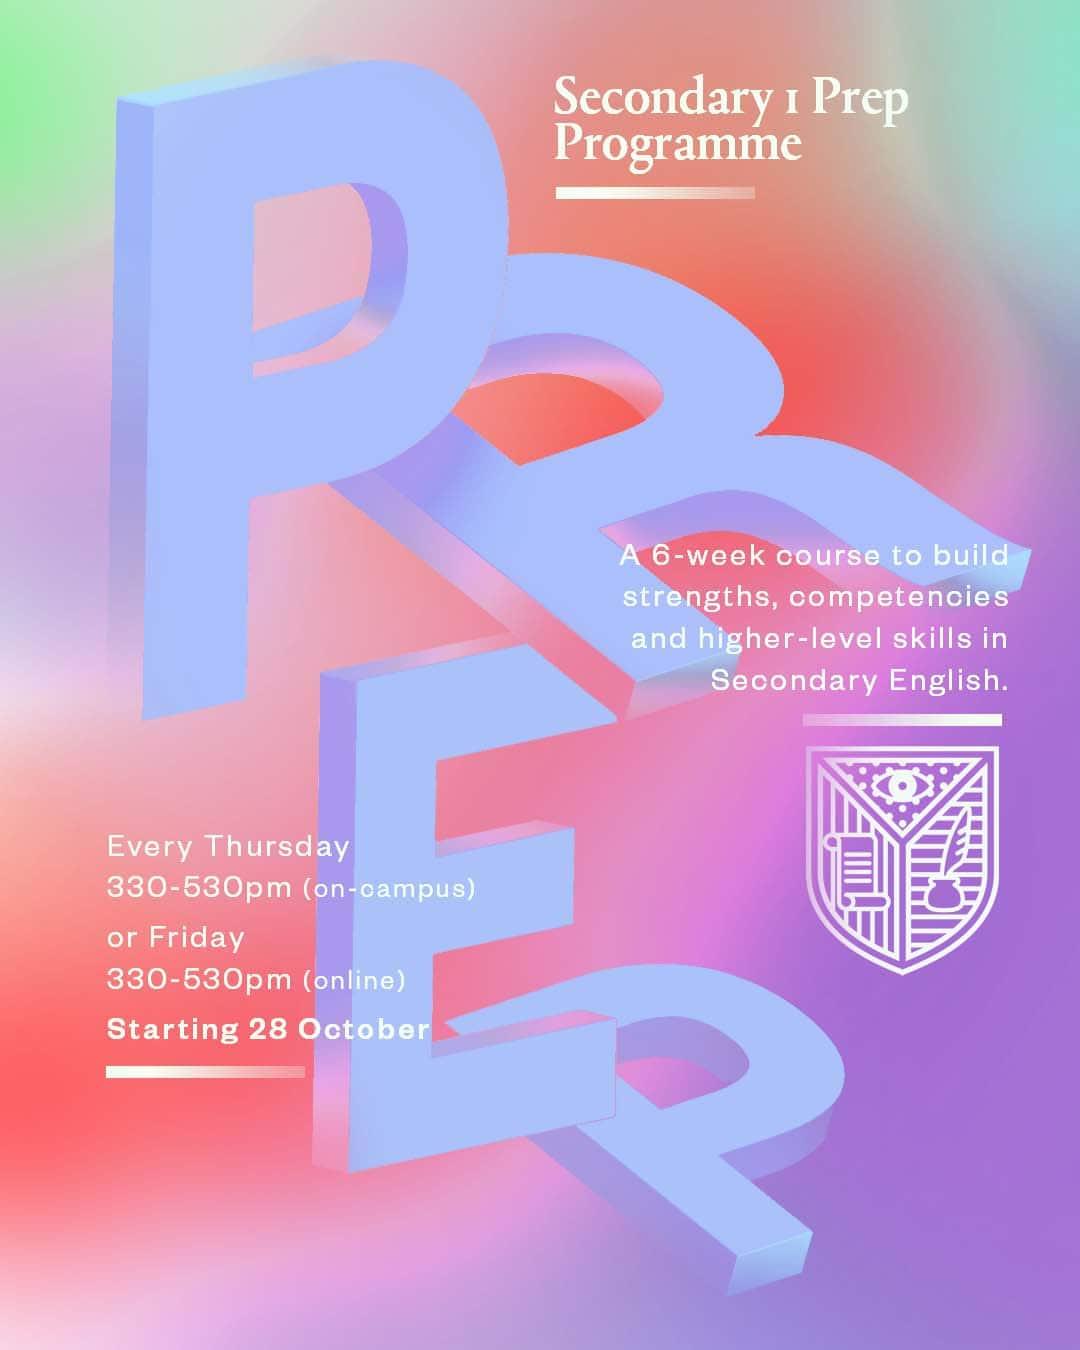 Information on Academia's 2021 Secondary Prep Programme